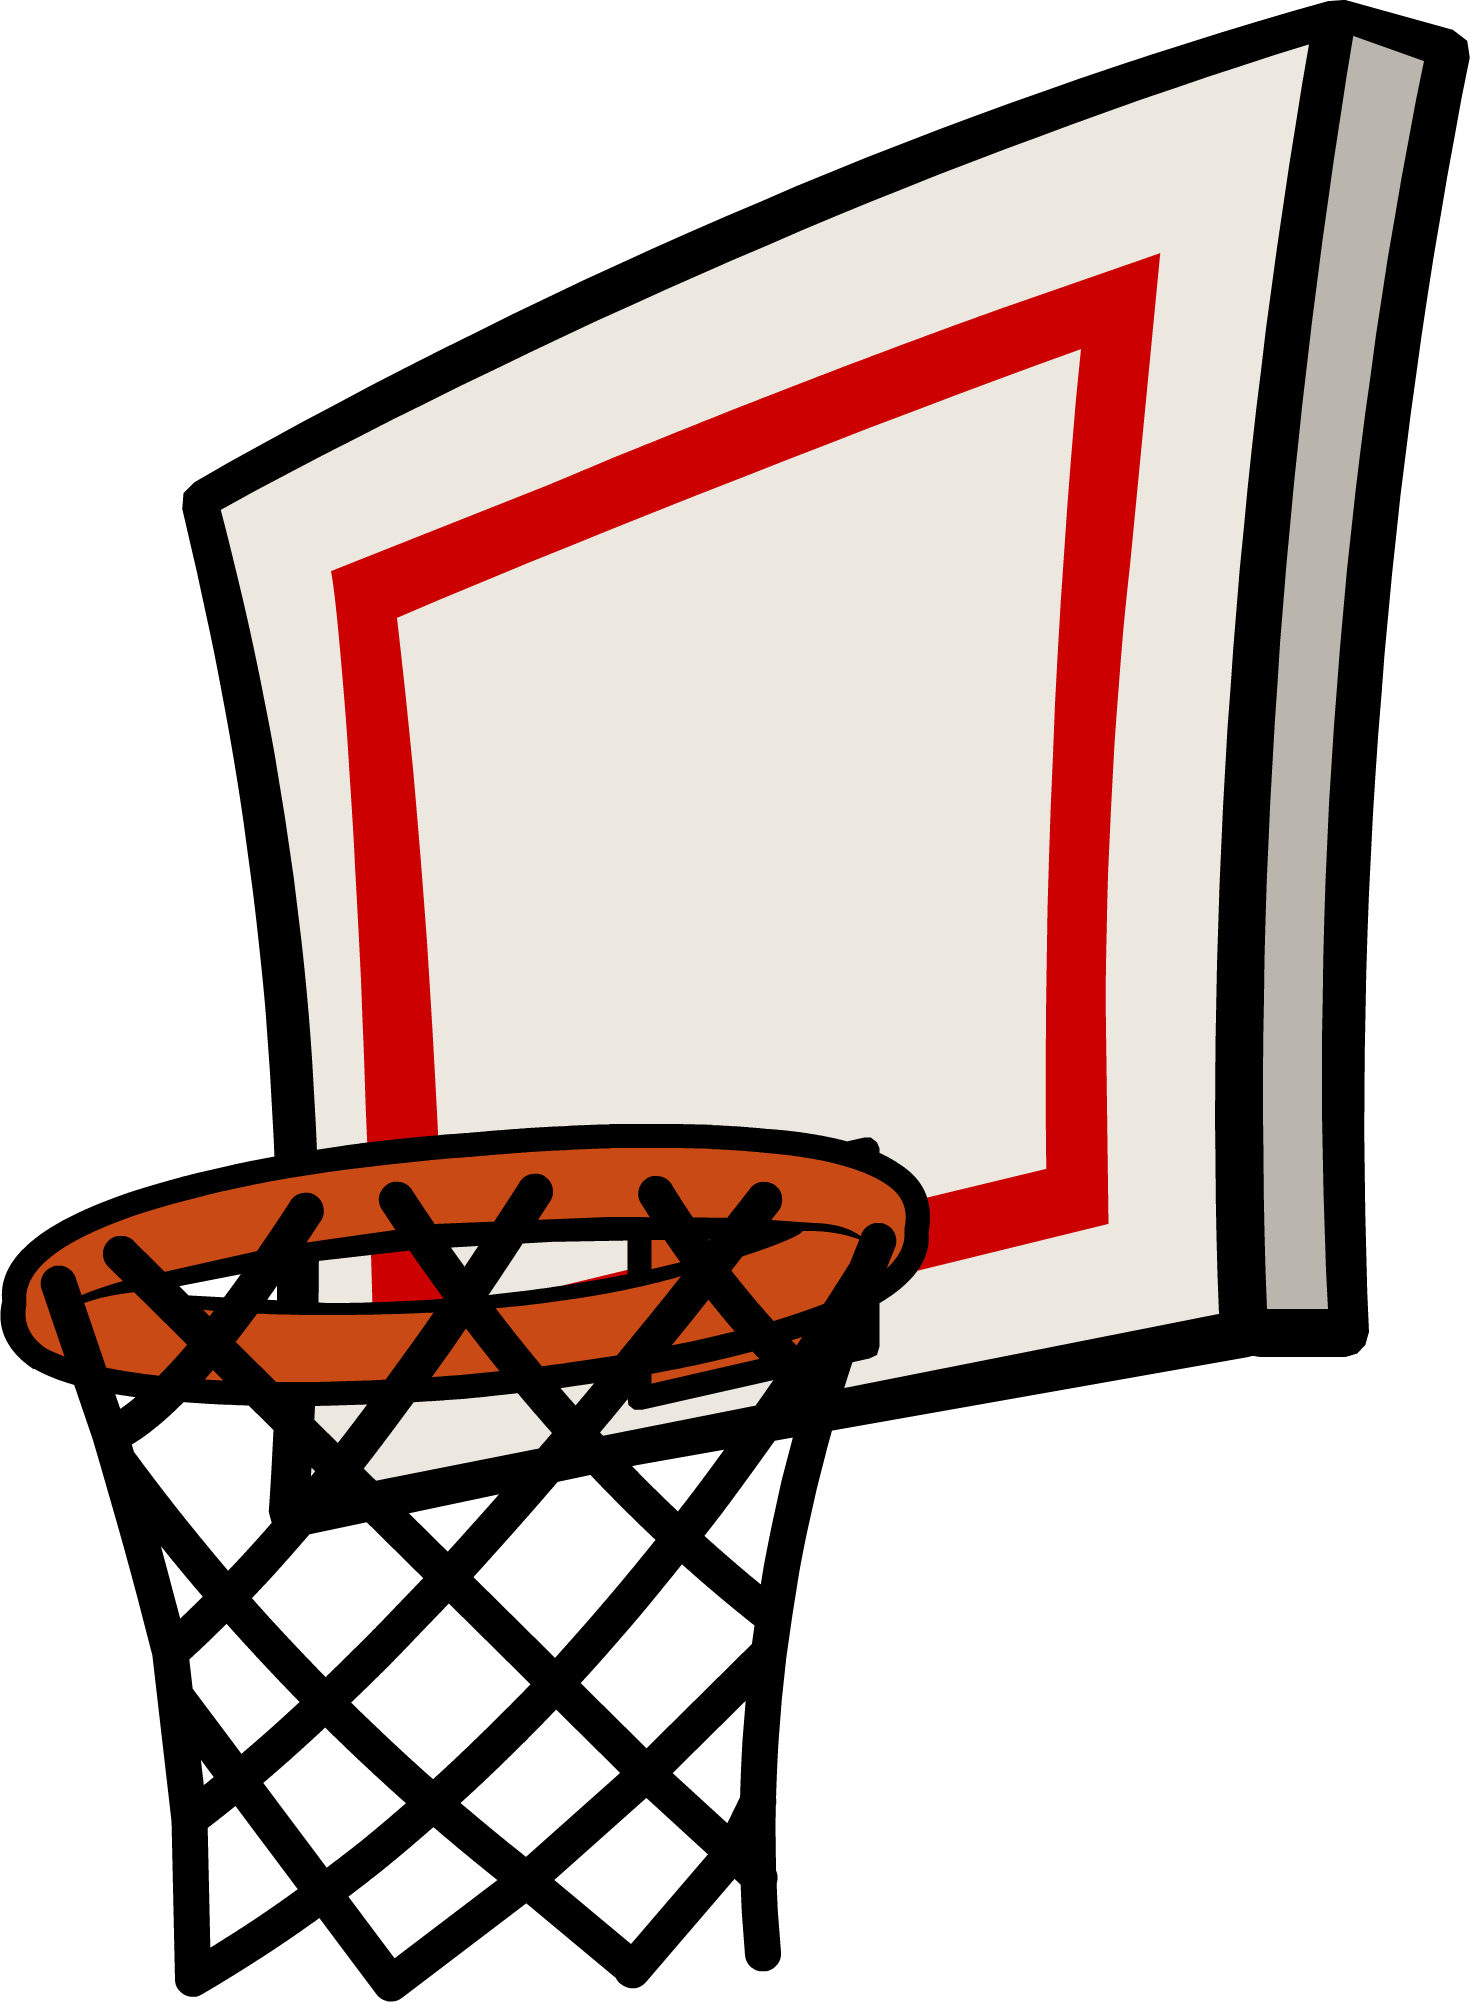 animated basketball hoop png 93980 eurogamer